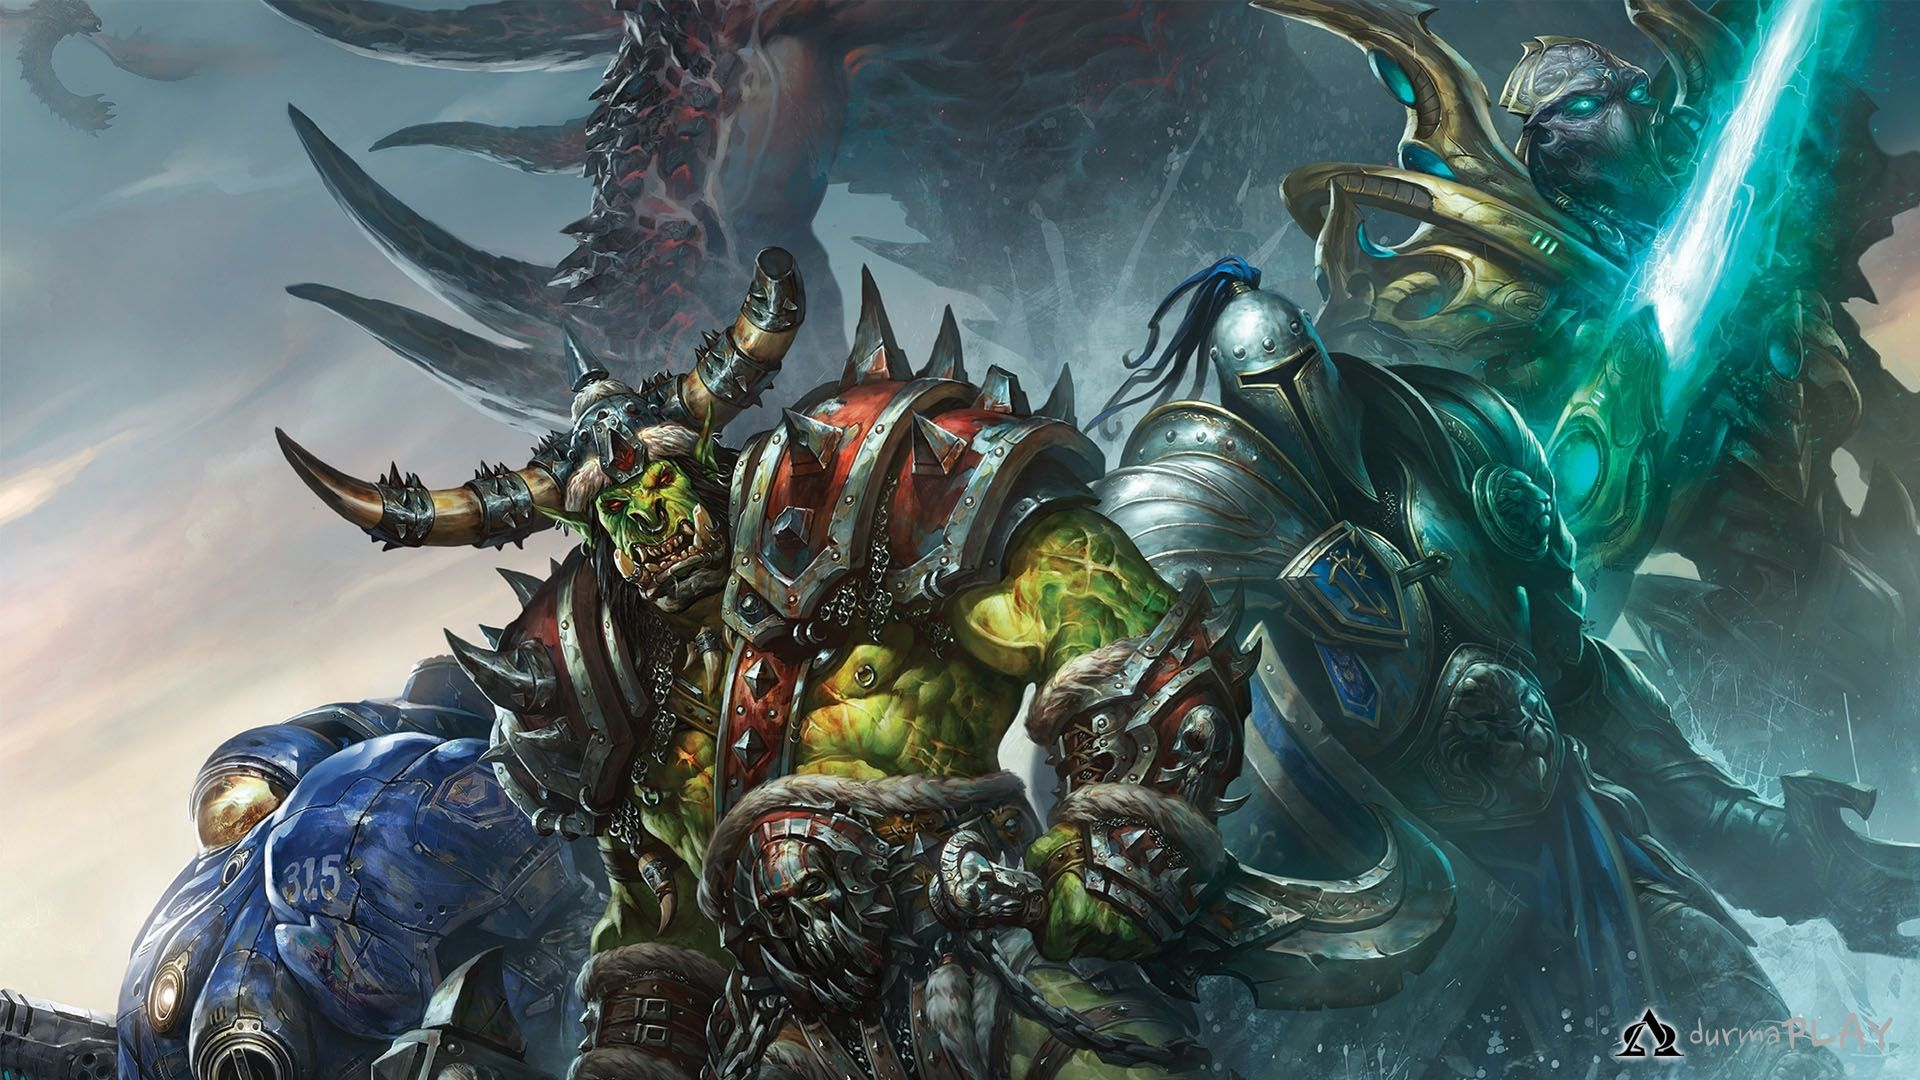 World of Warcraft - https://www.durmaplay.com/product/world-of-warcraft-gold-wow-altin-prepaid-cdkey